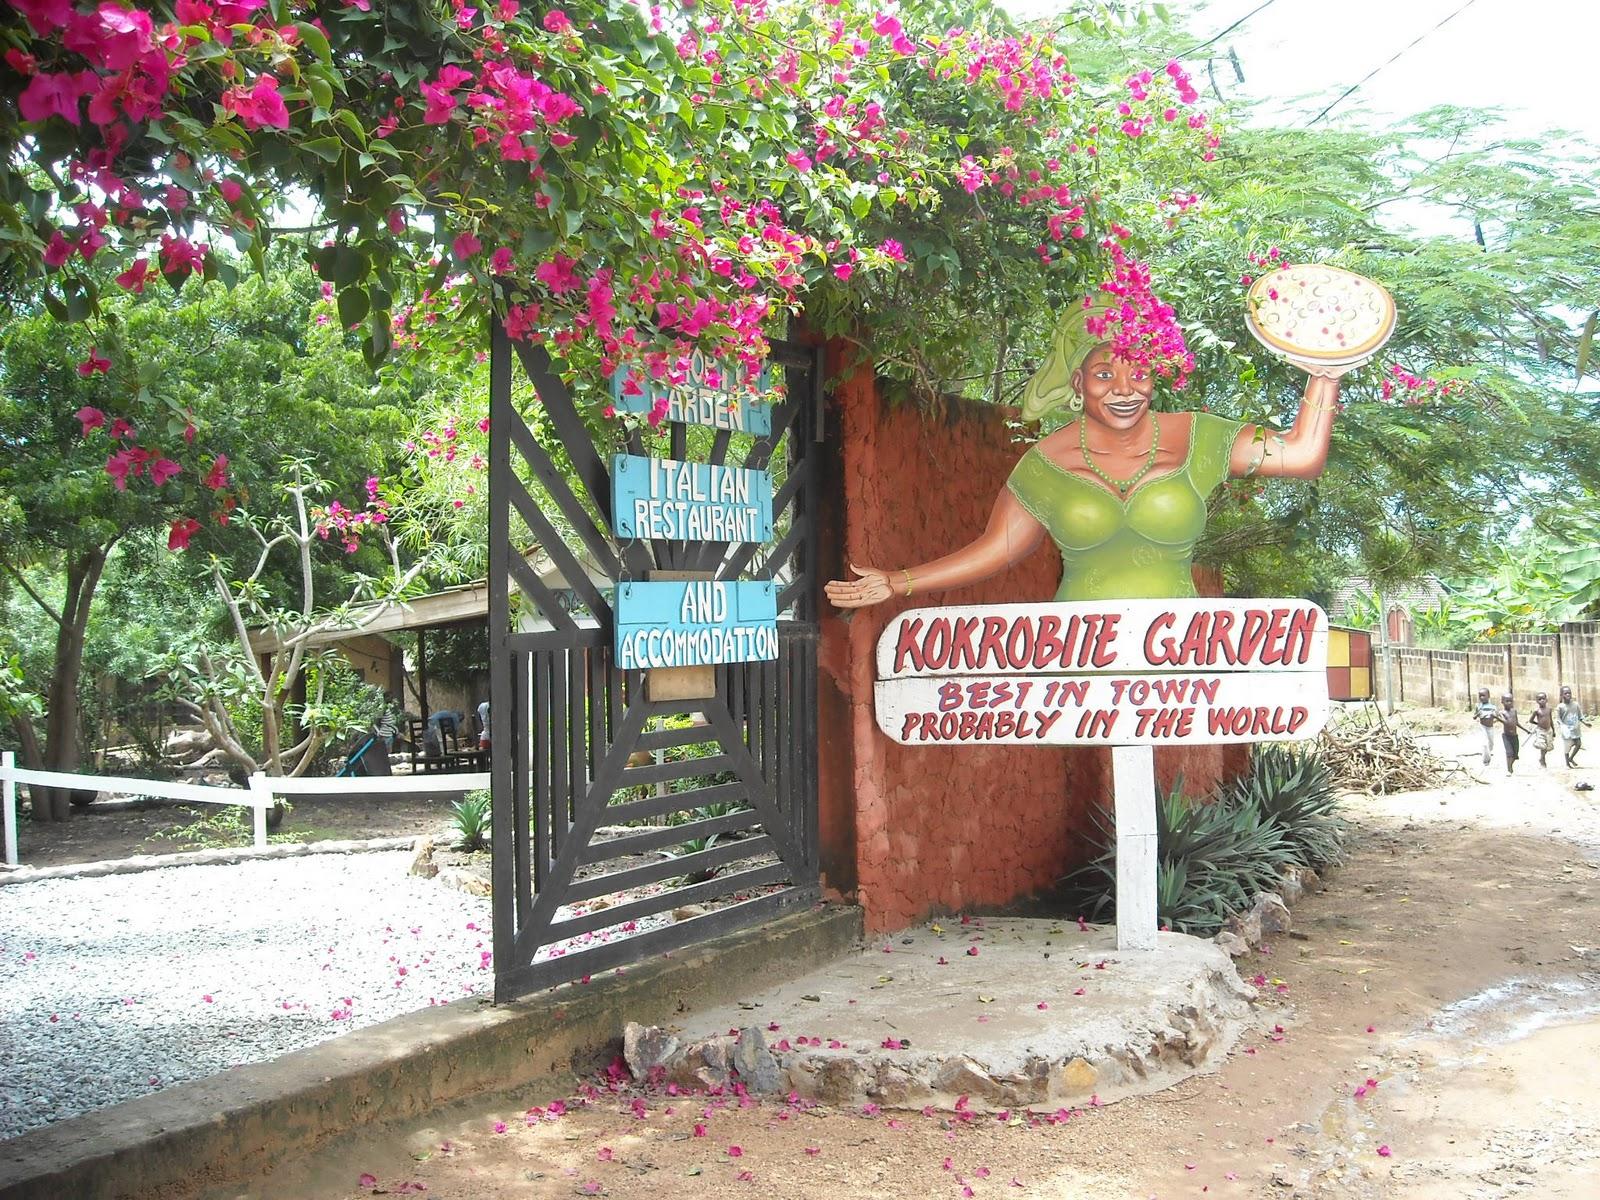 kokrobite garden is a small hotel resort located near the beach